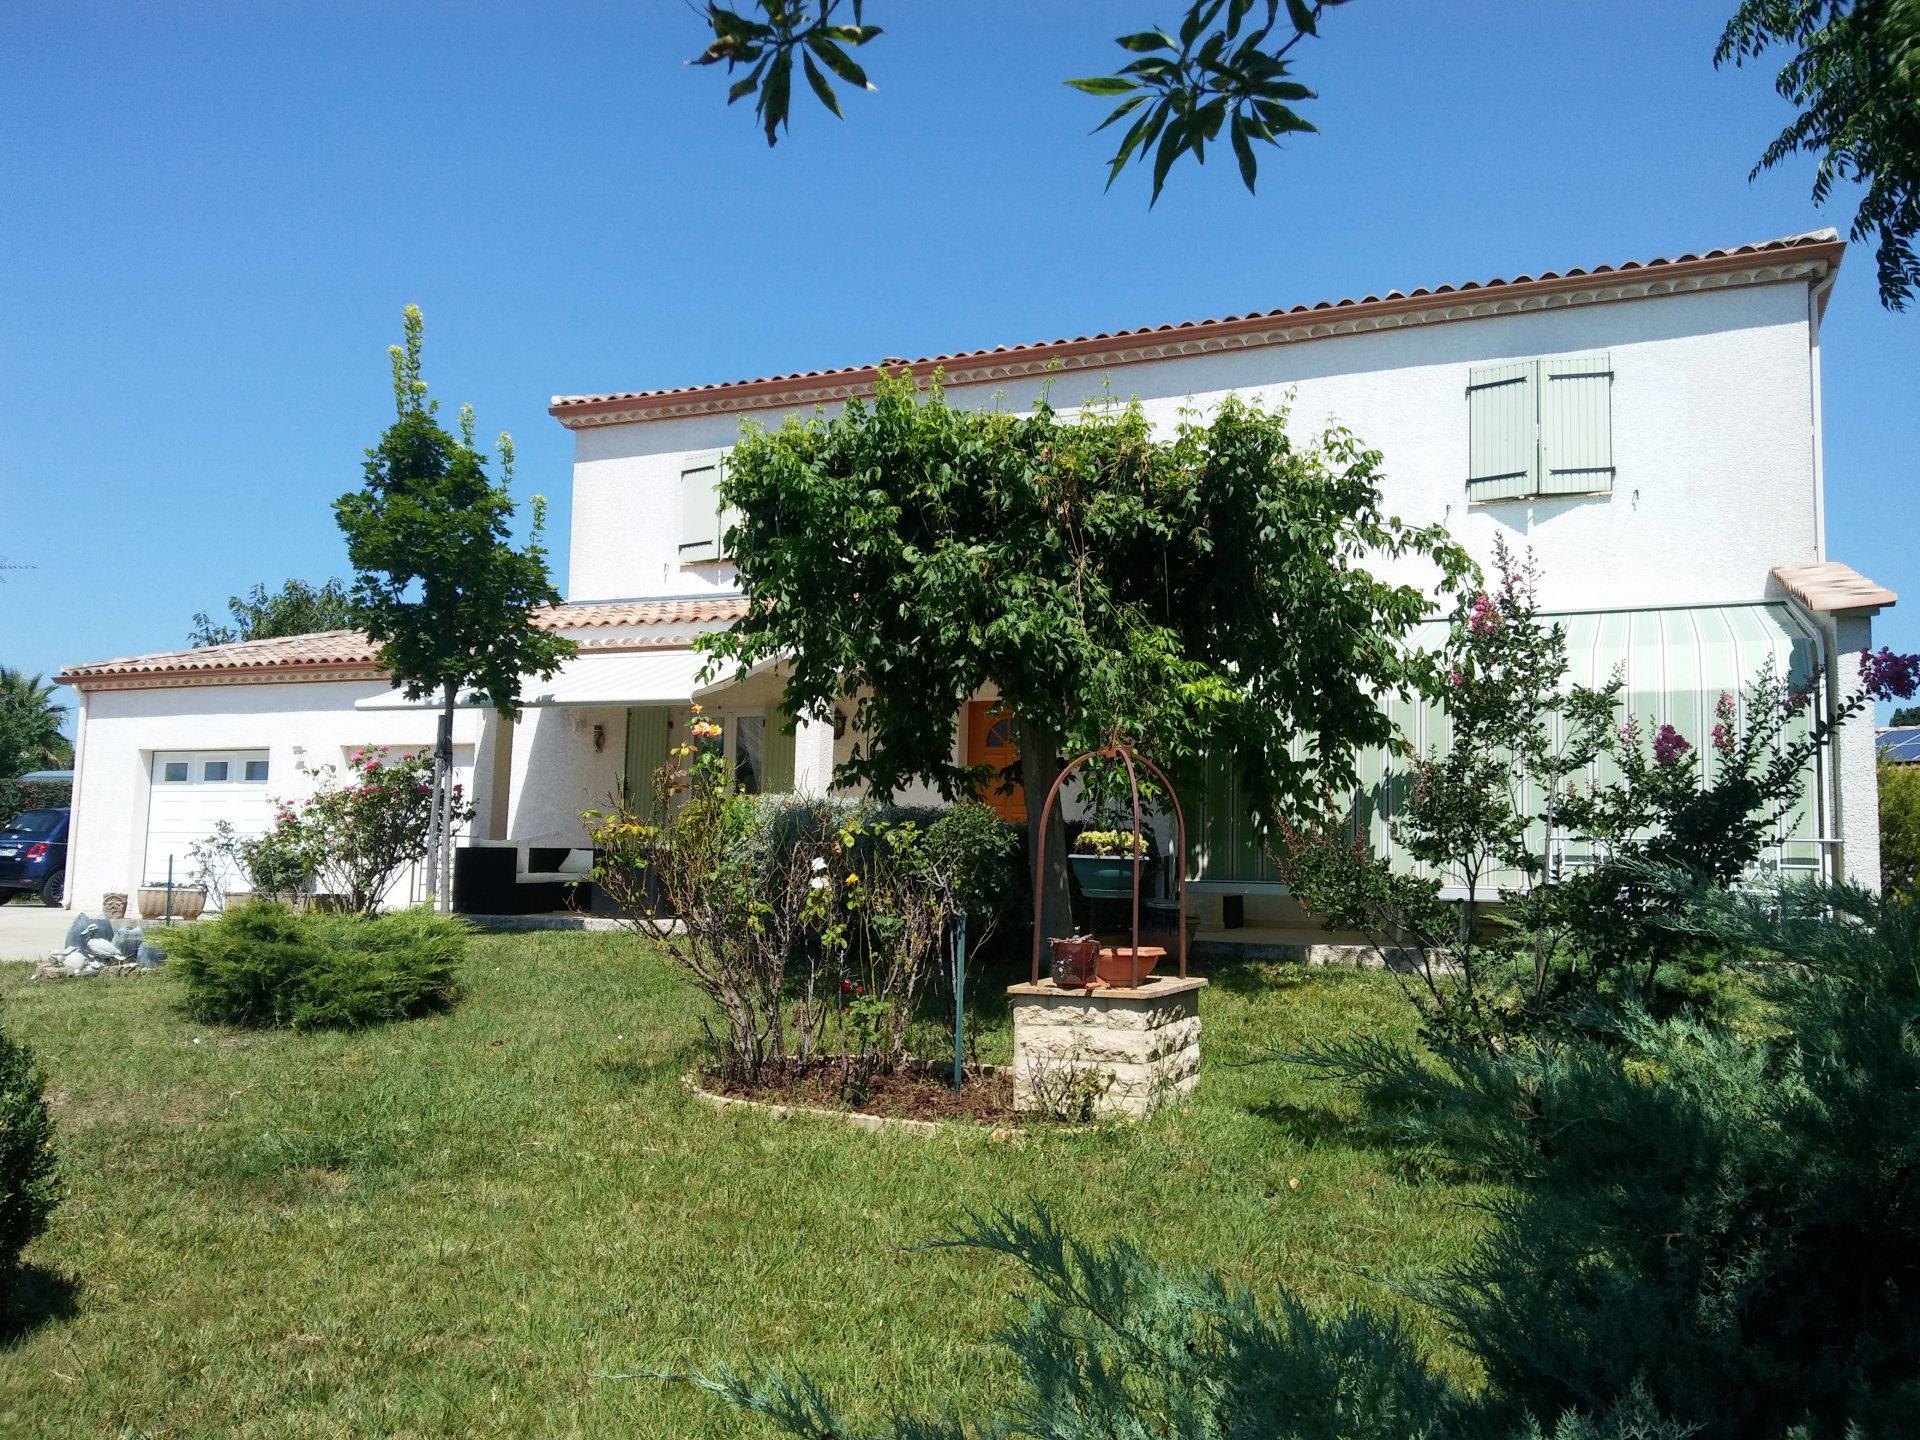 Villa with big garden and nice views